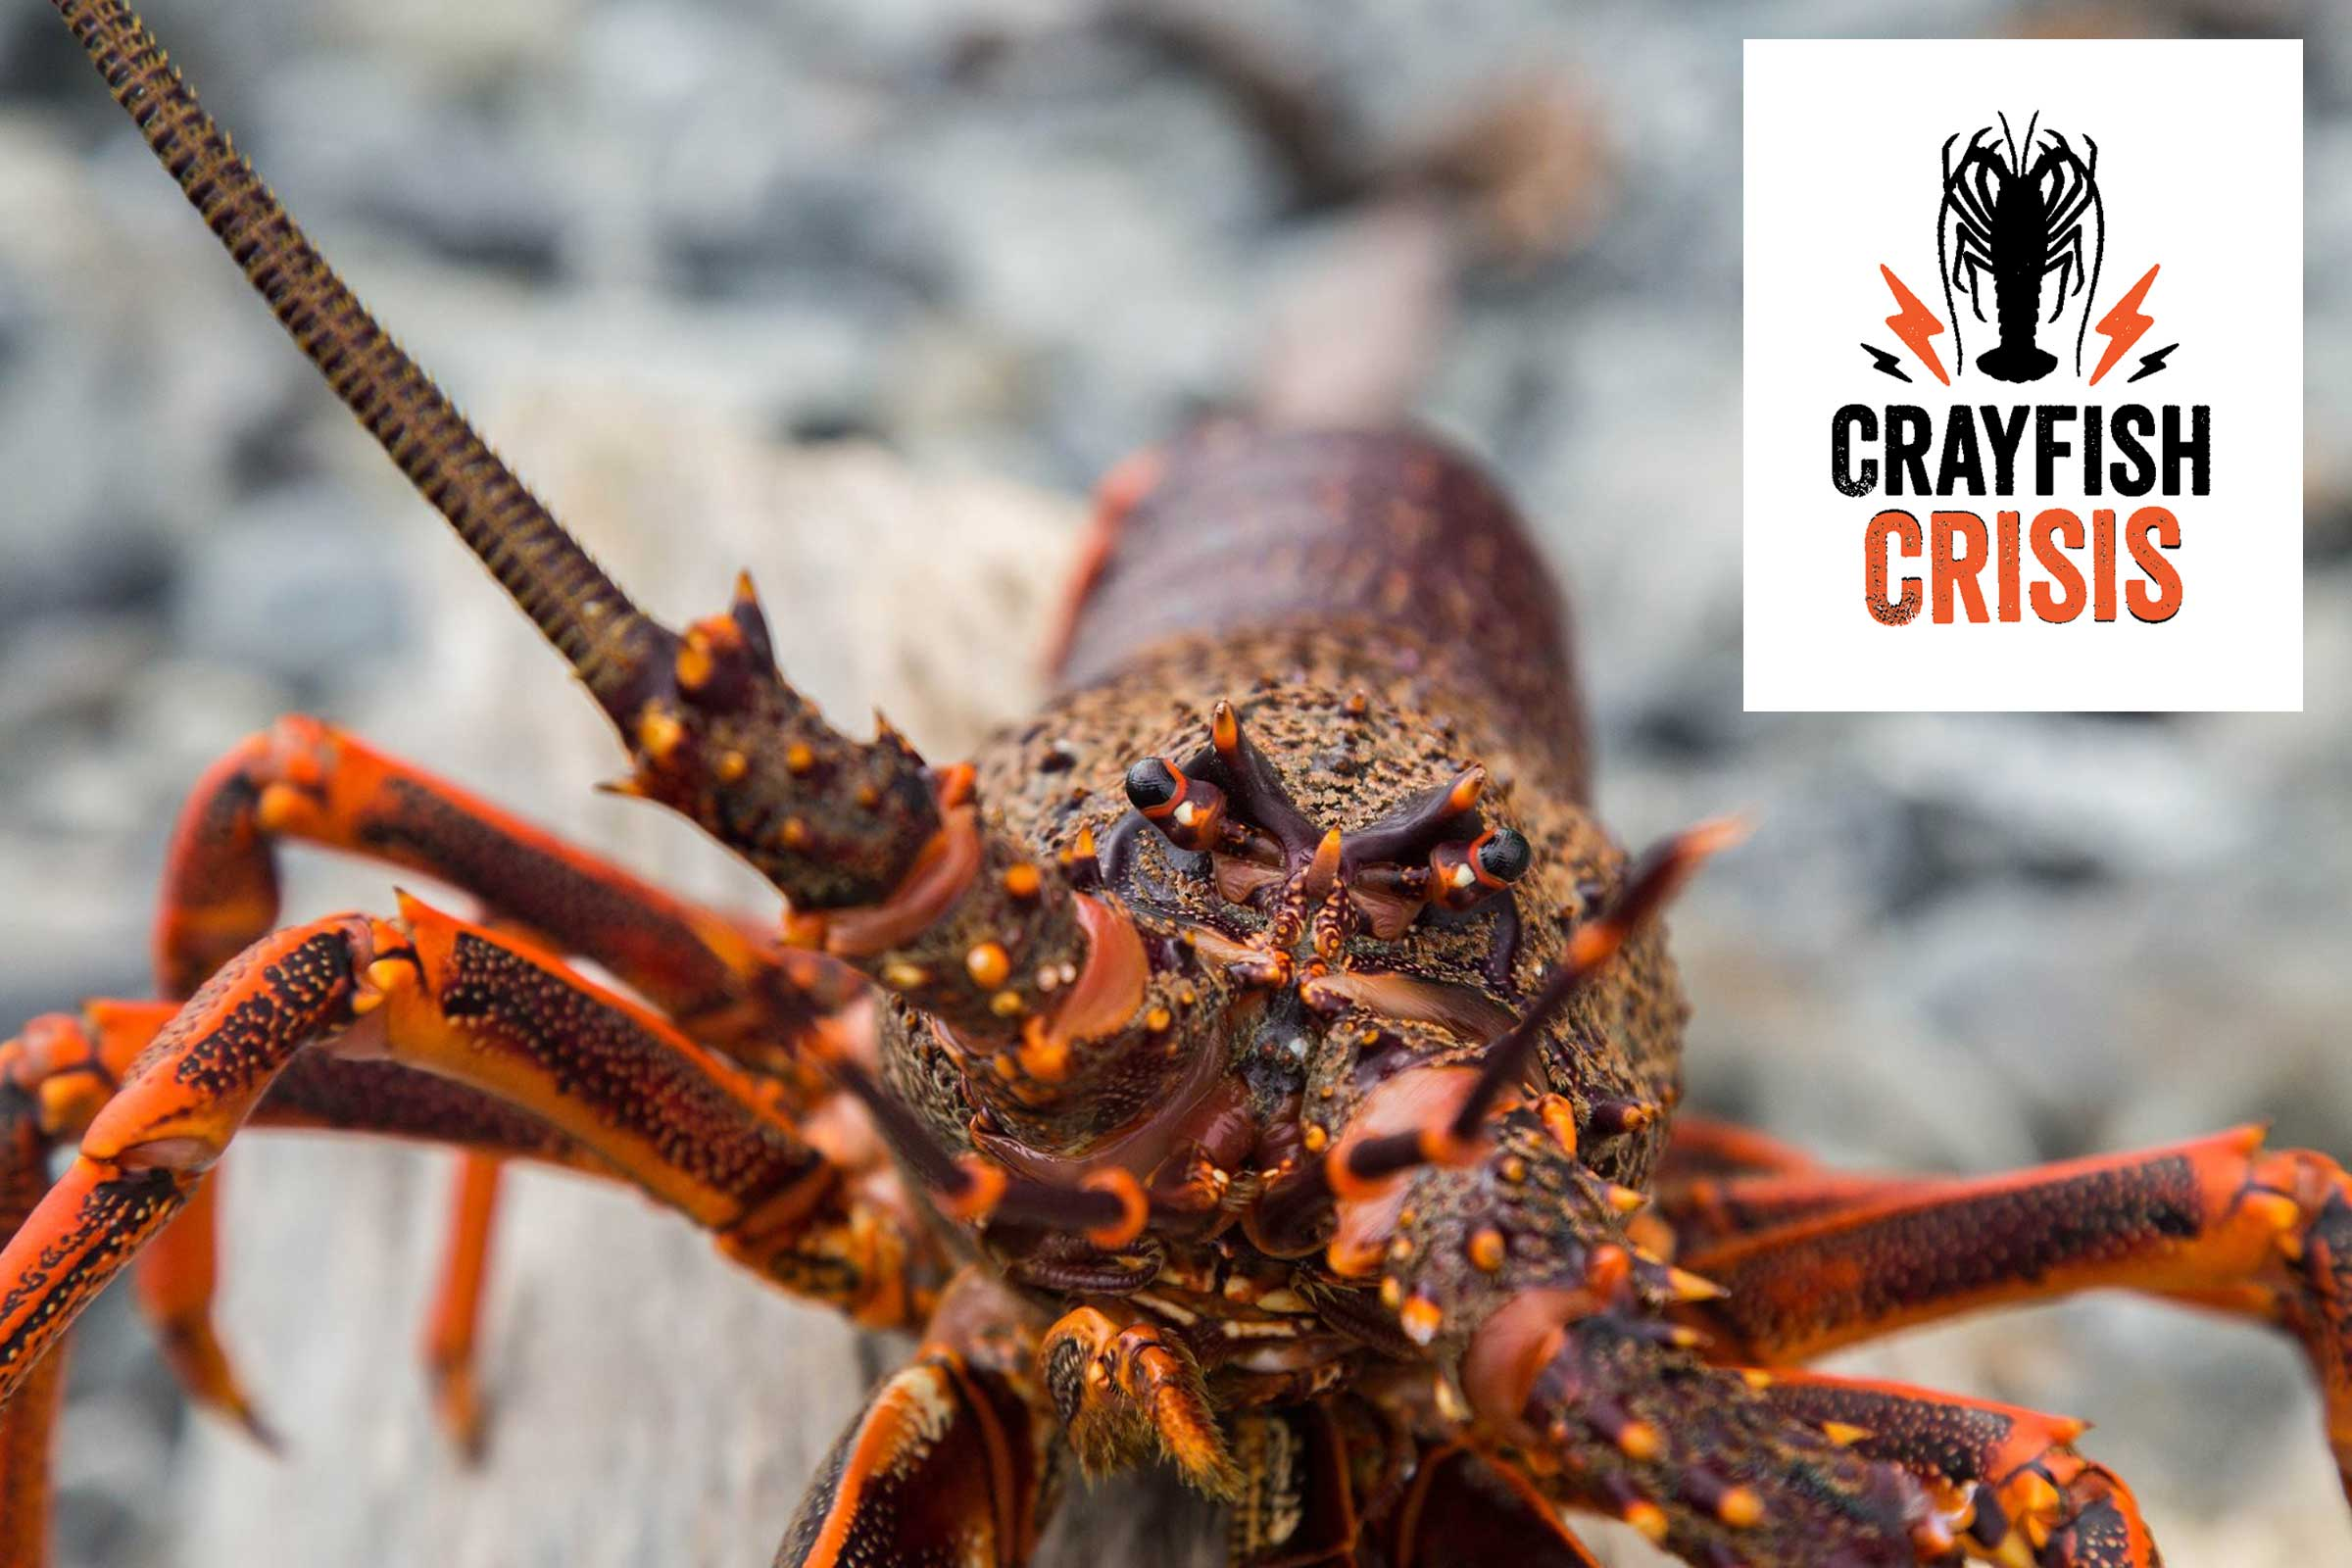 LegaSea - Voluntary Crayfish Bag Limit Reduction